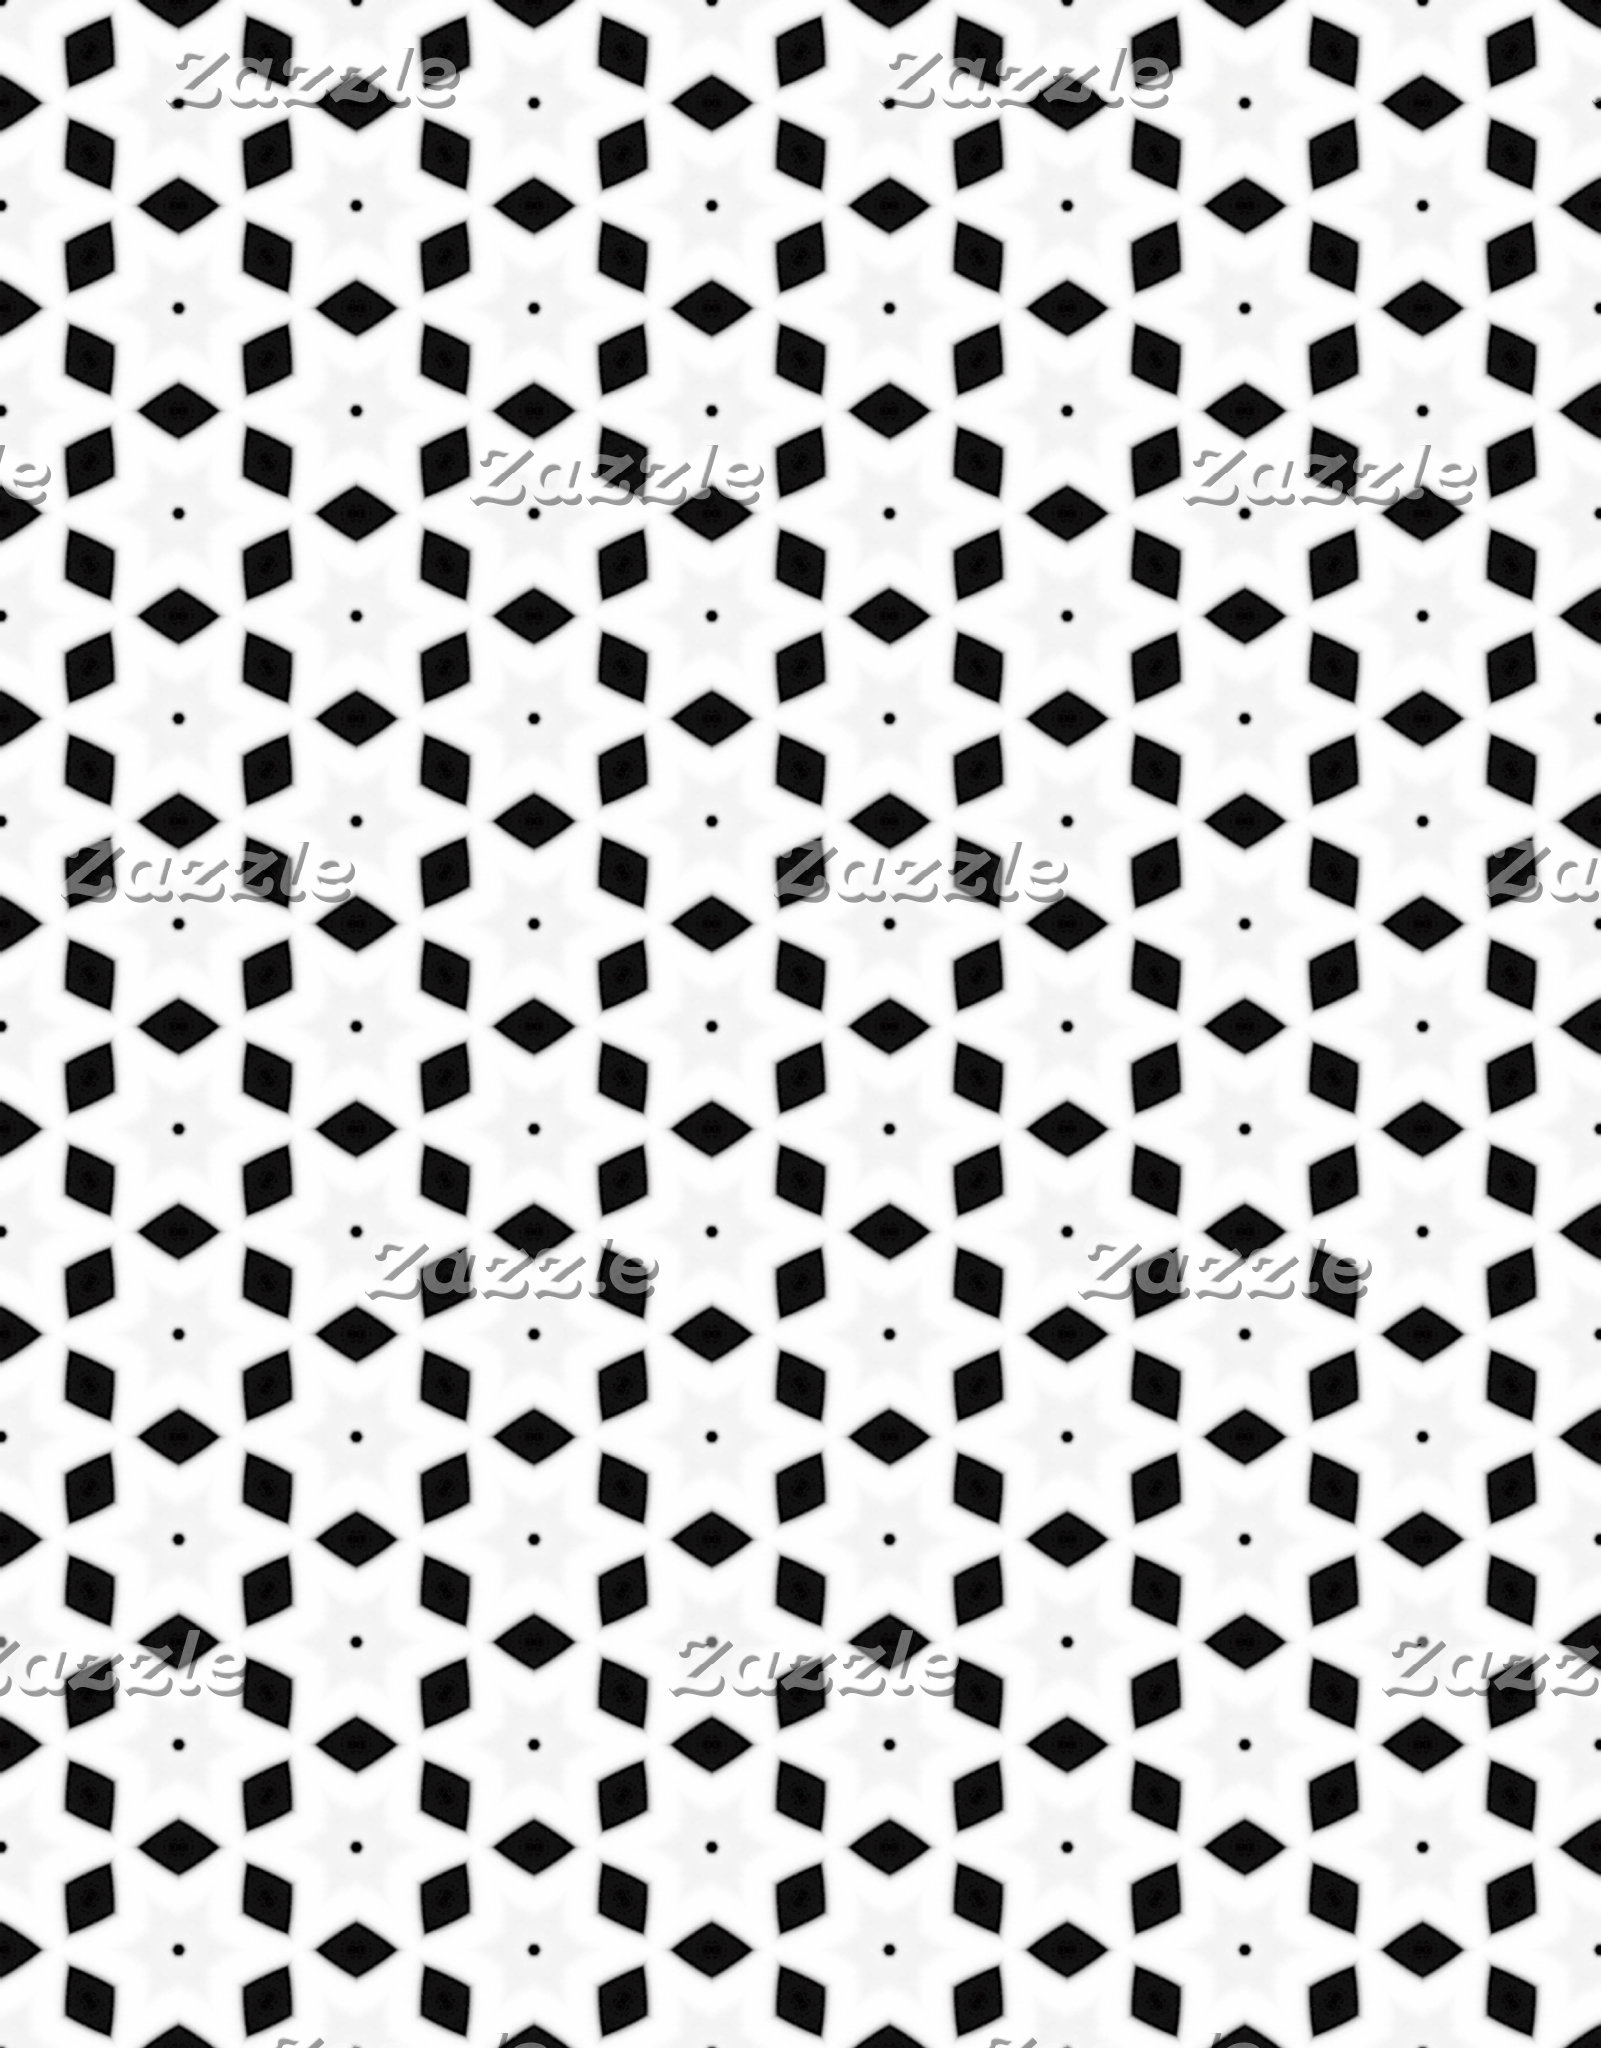 Black and White Patterns | Diamonds and Stars II